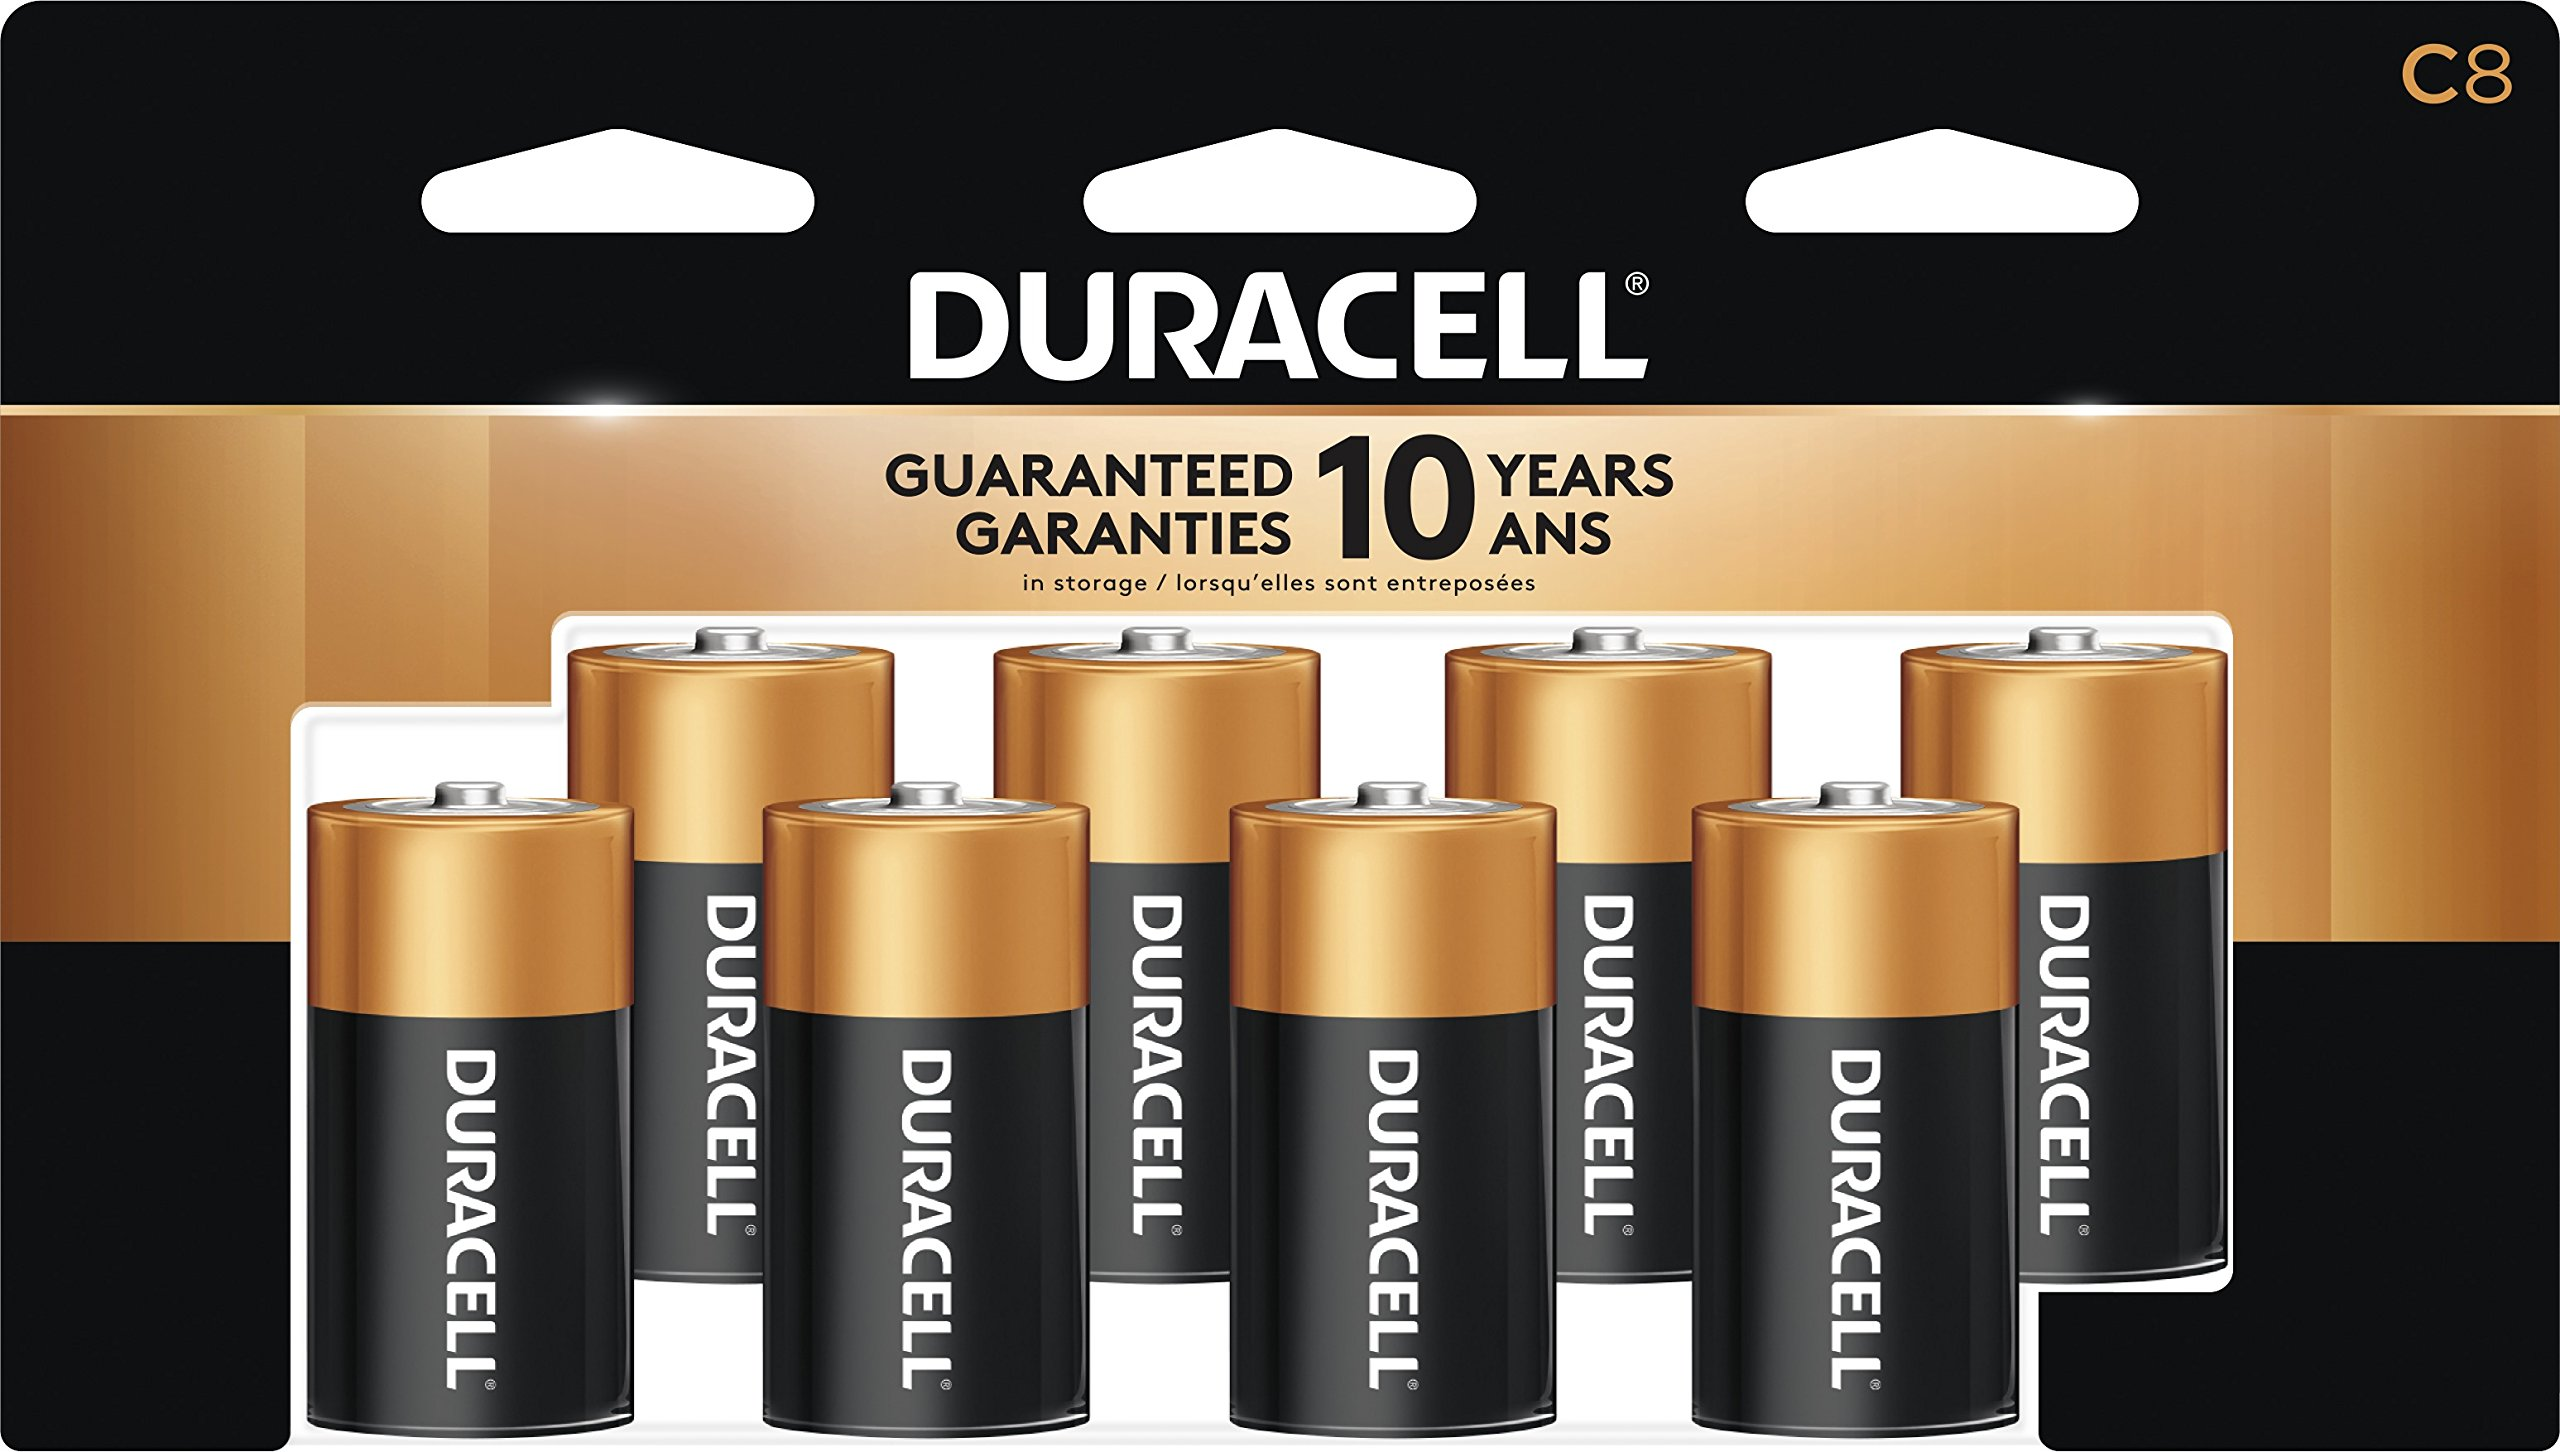 Duracell Coppertop C Alkaline Batteries, 8 ct